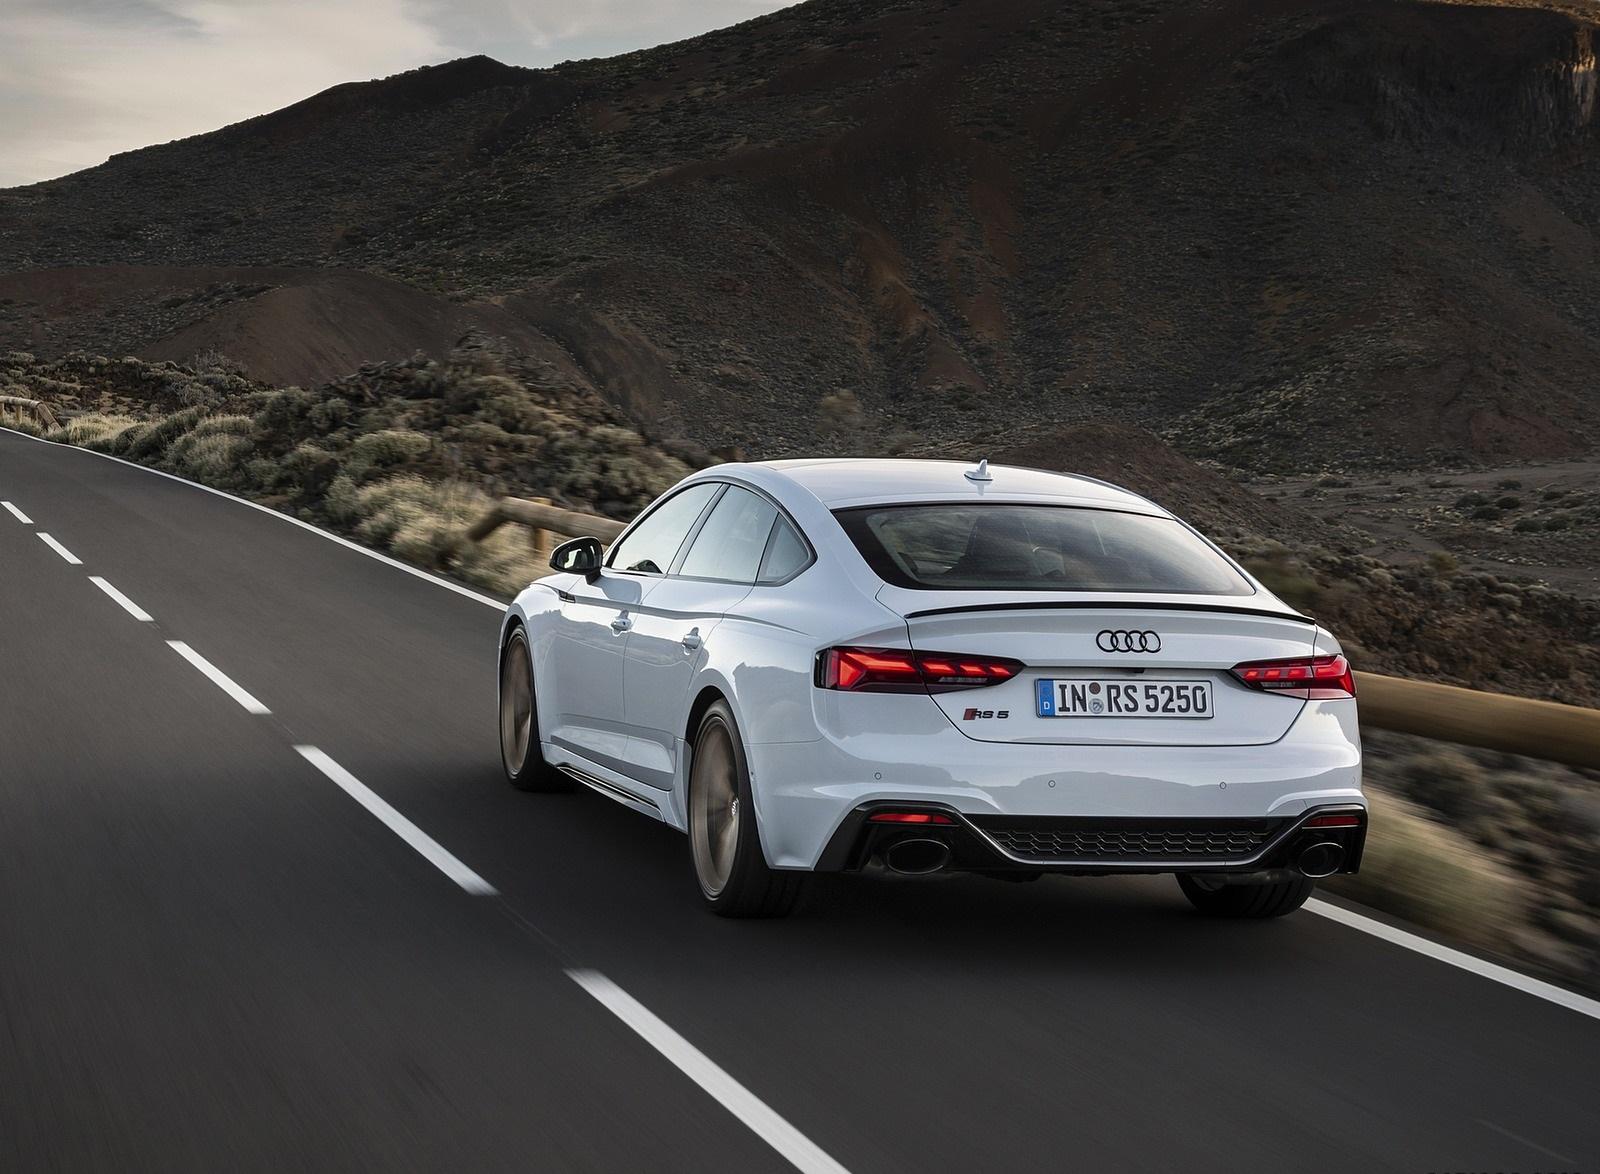 2020 Audi RS 5 Sportback (Color: Glacier White) Rear Three-Quarter Wallpapers (3)